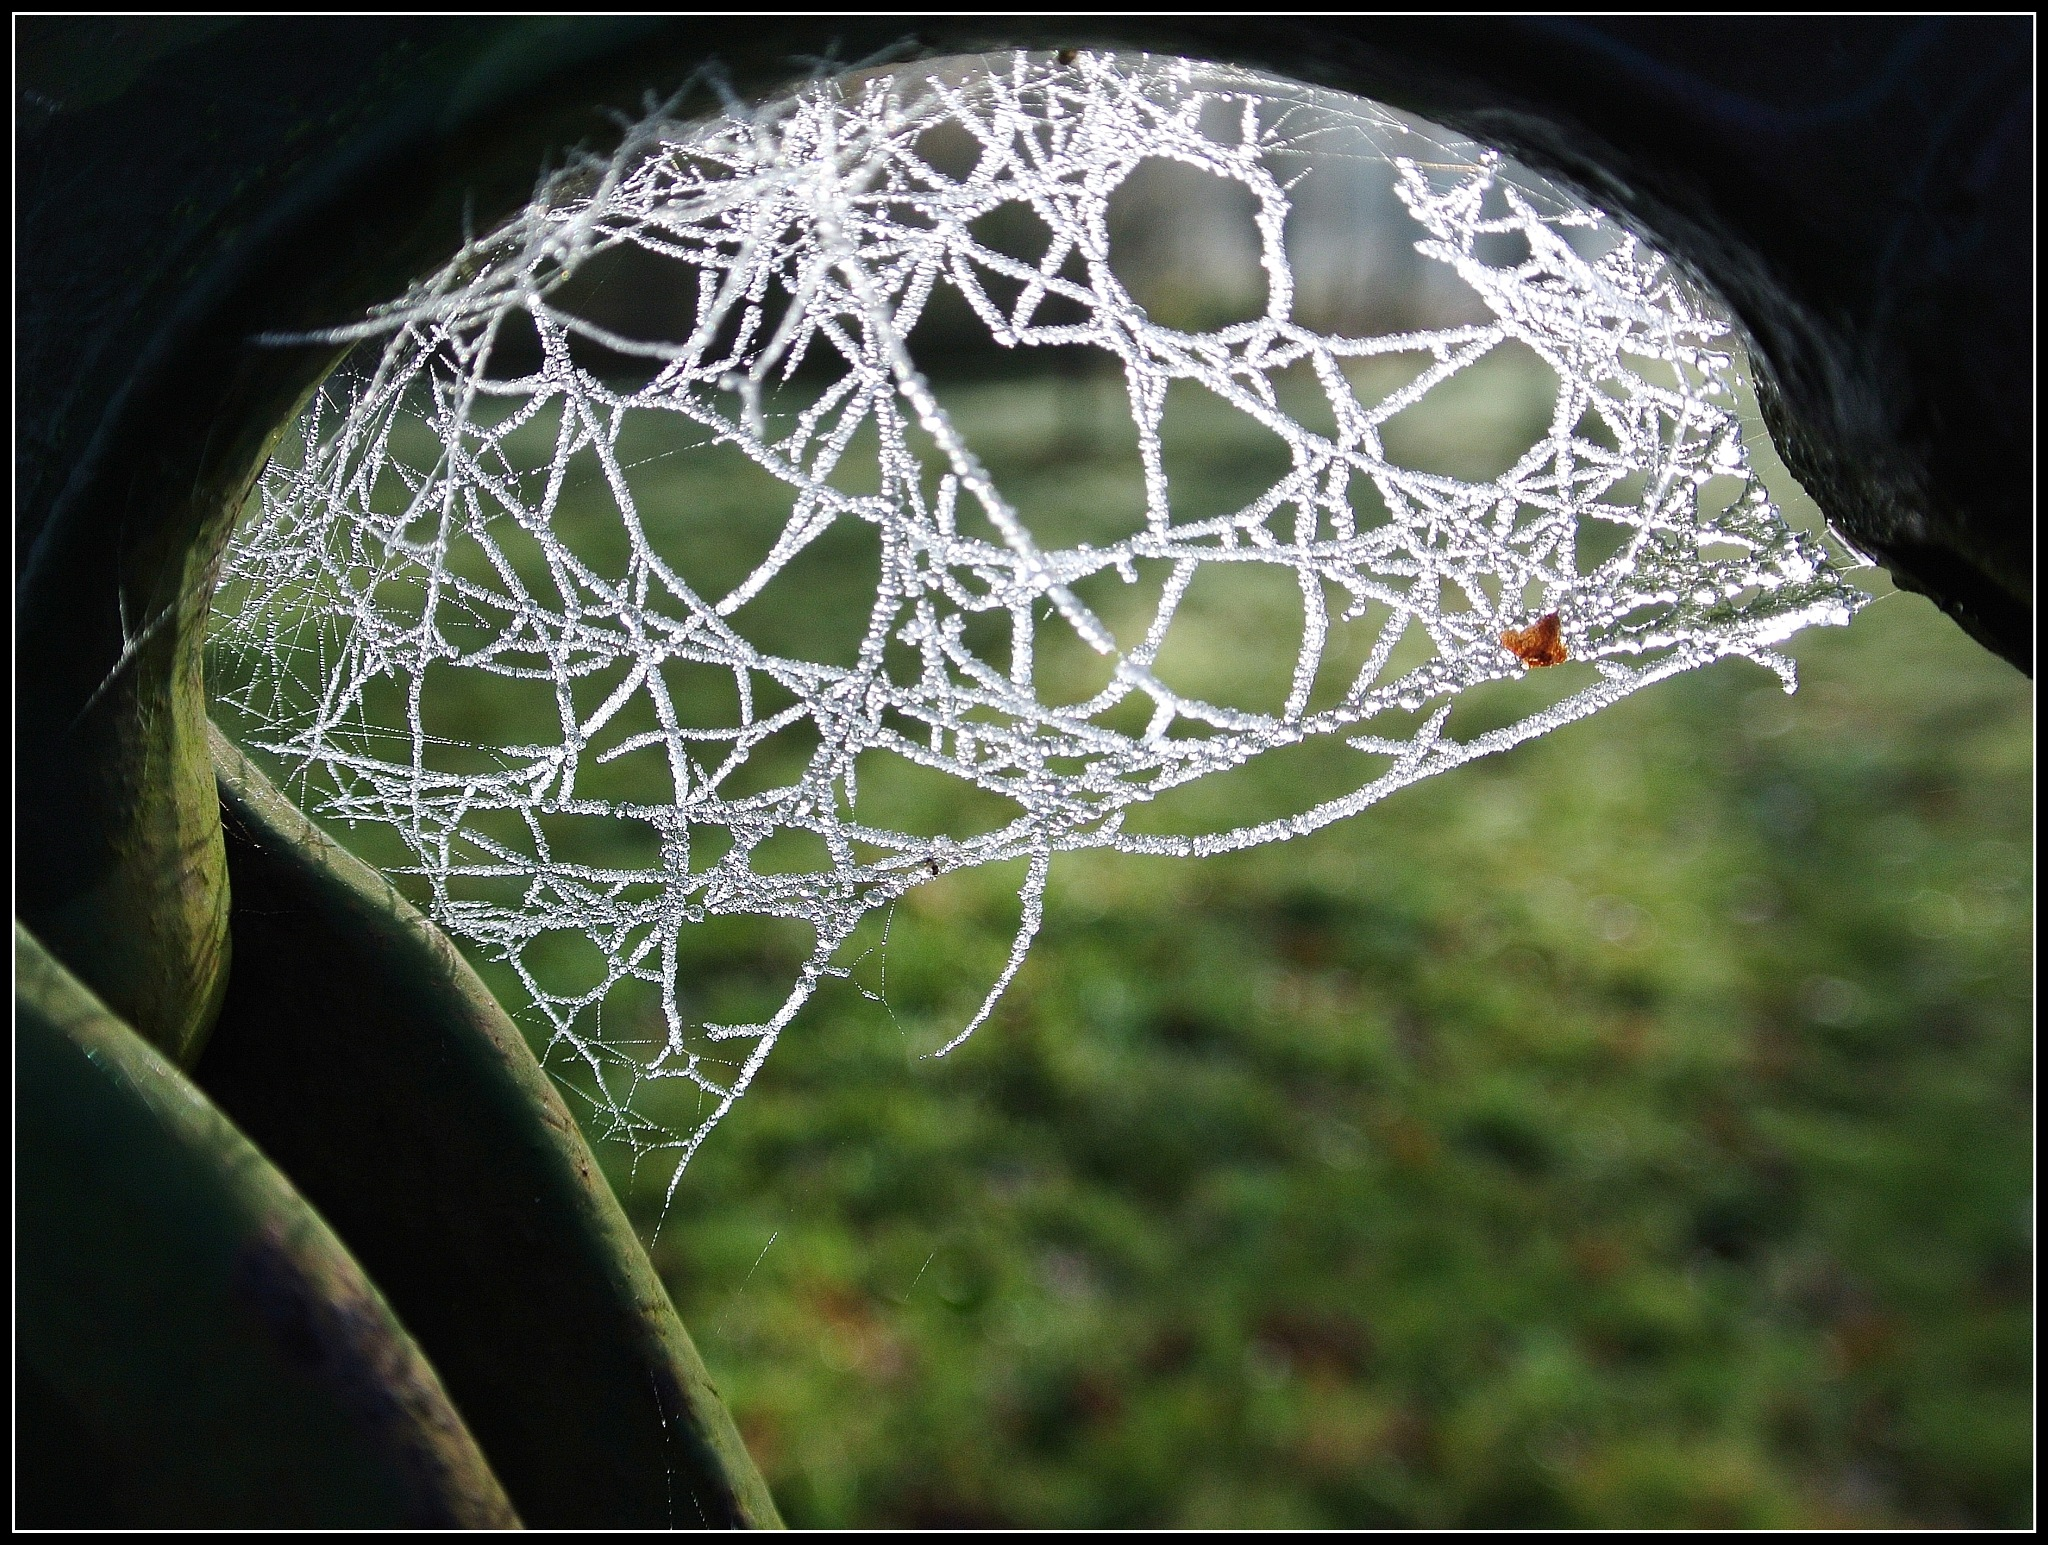 SPIDER ARTWORKS by Jacob van der Veen